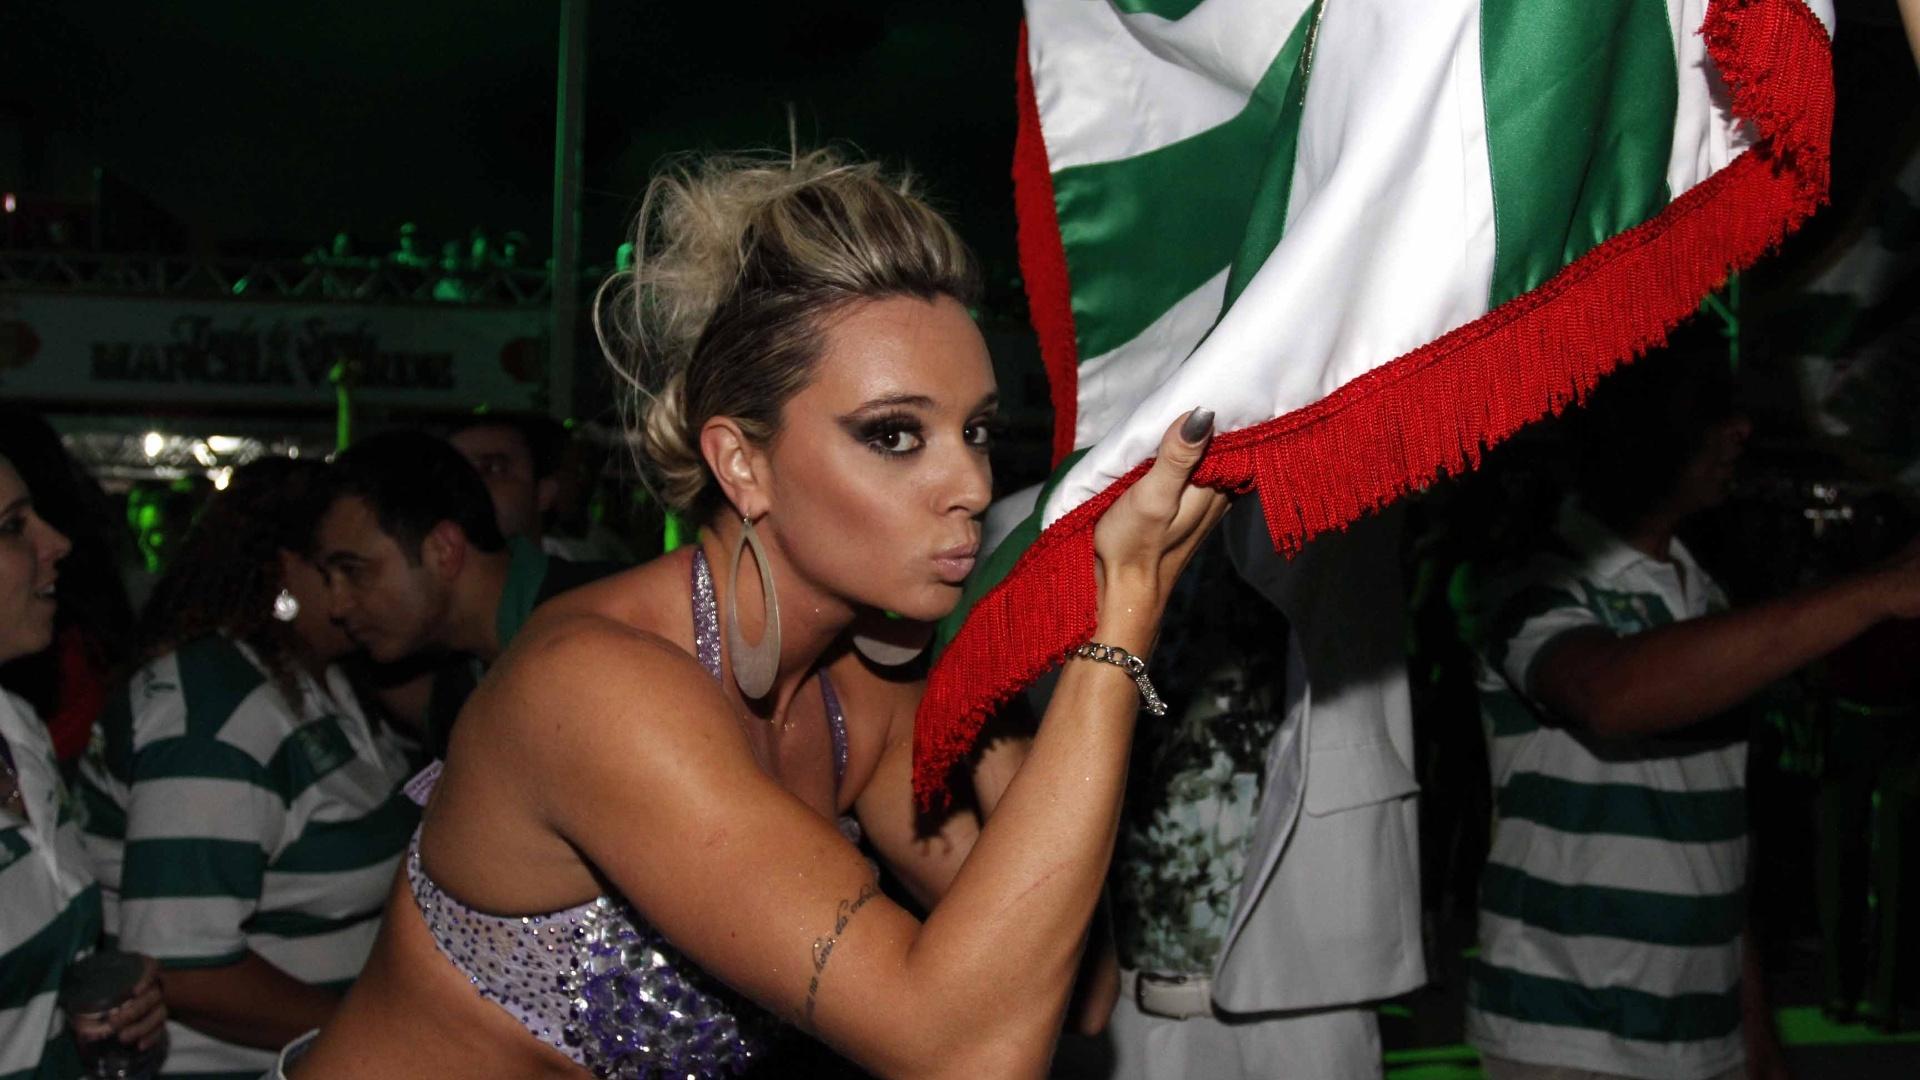 27.jan.2013 - Juju Salimeni beija a bandeira da escola de samba Mancha Verde, da qual é musa